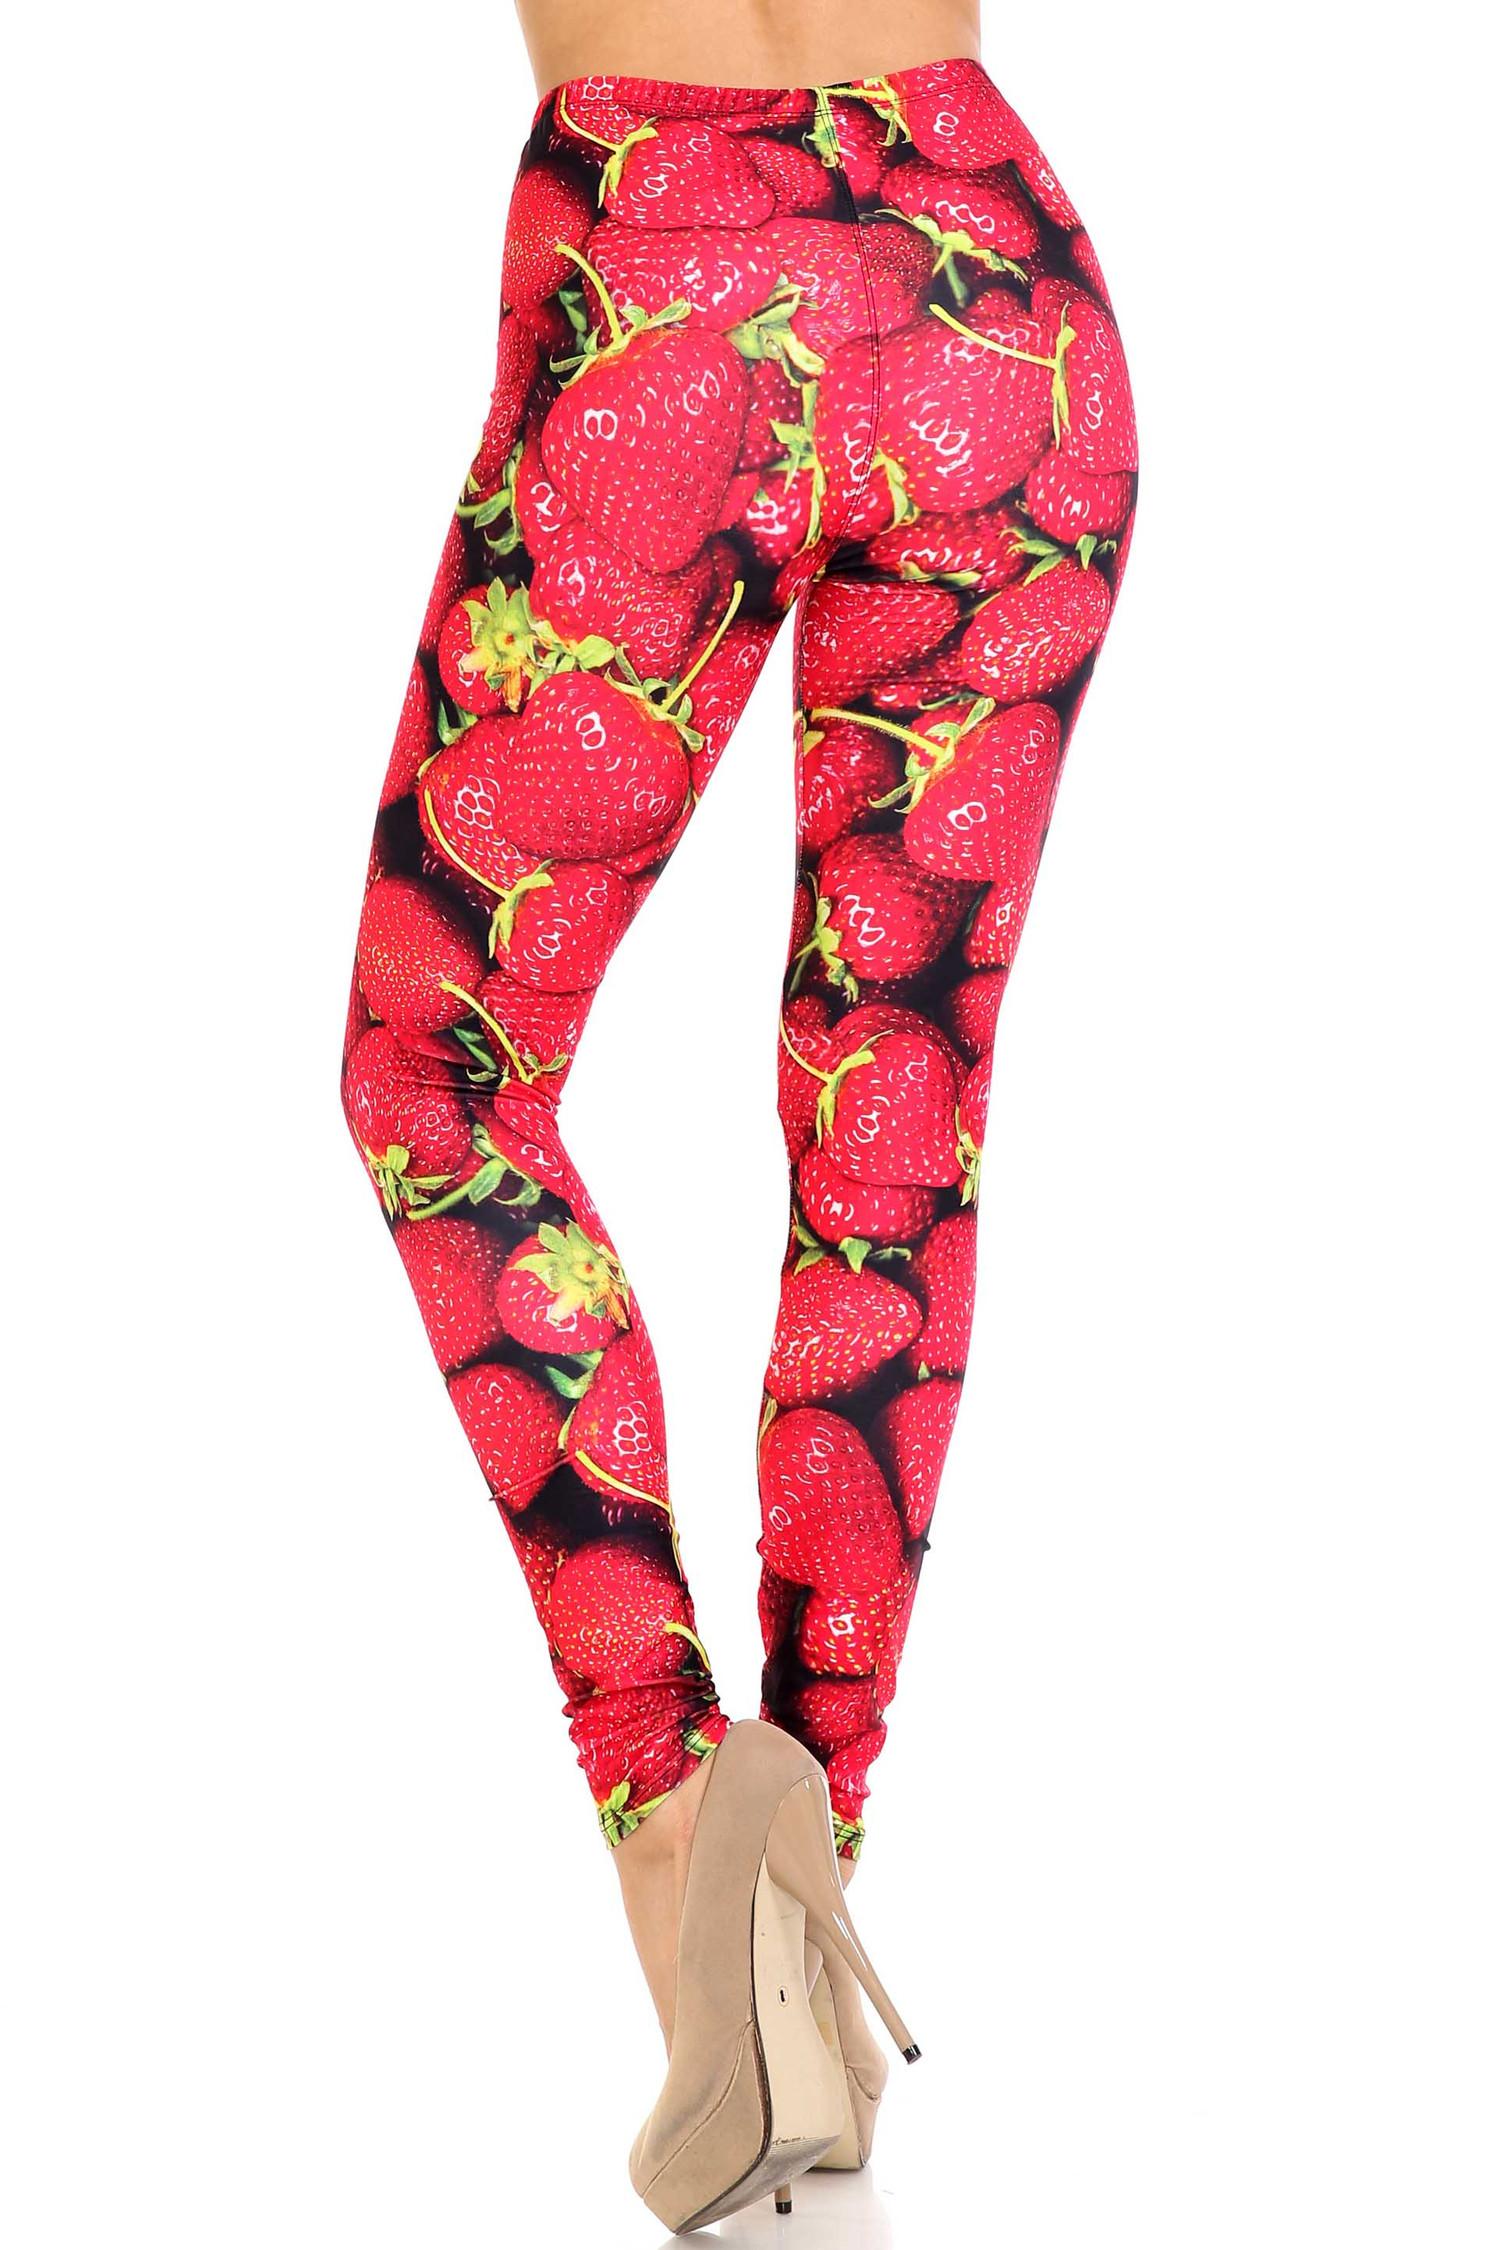 Creamy Soft Strawberry Leggings - USA Fashion™